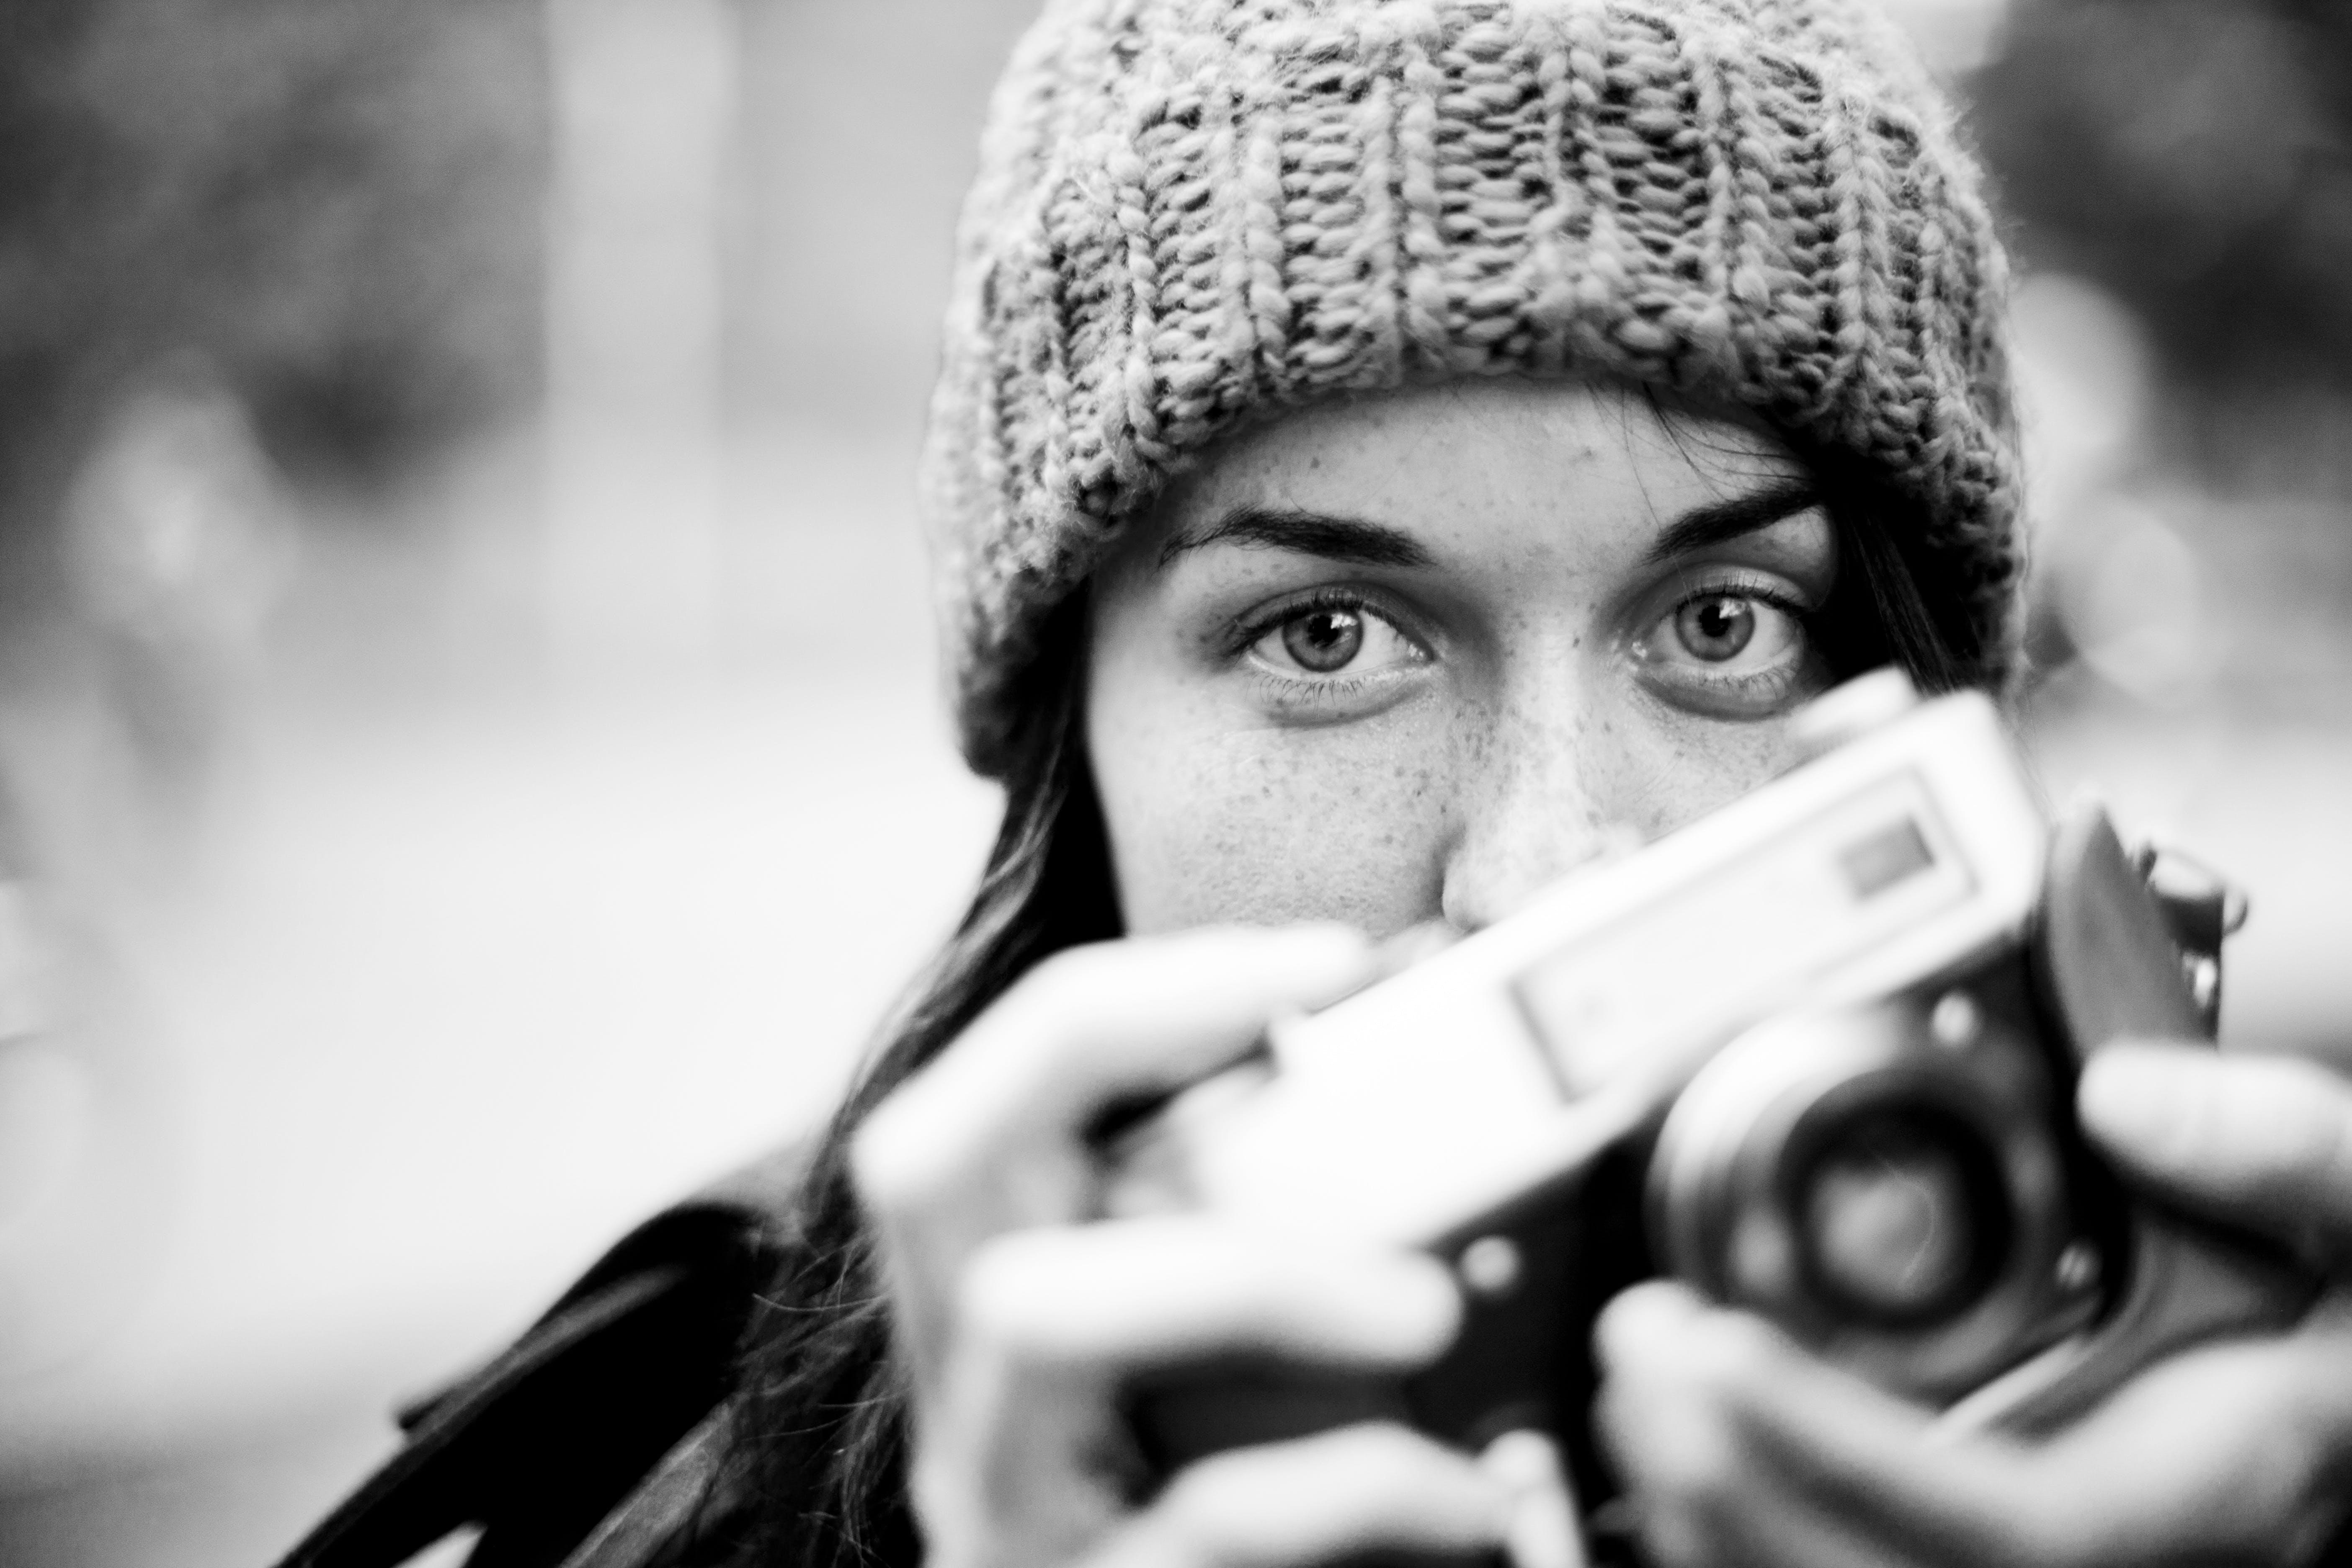 Kostenloses Stock Foto zu erwachsener, fashion, fotograf, fotografie